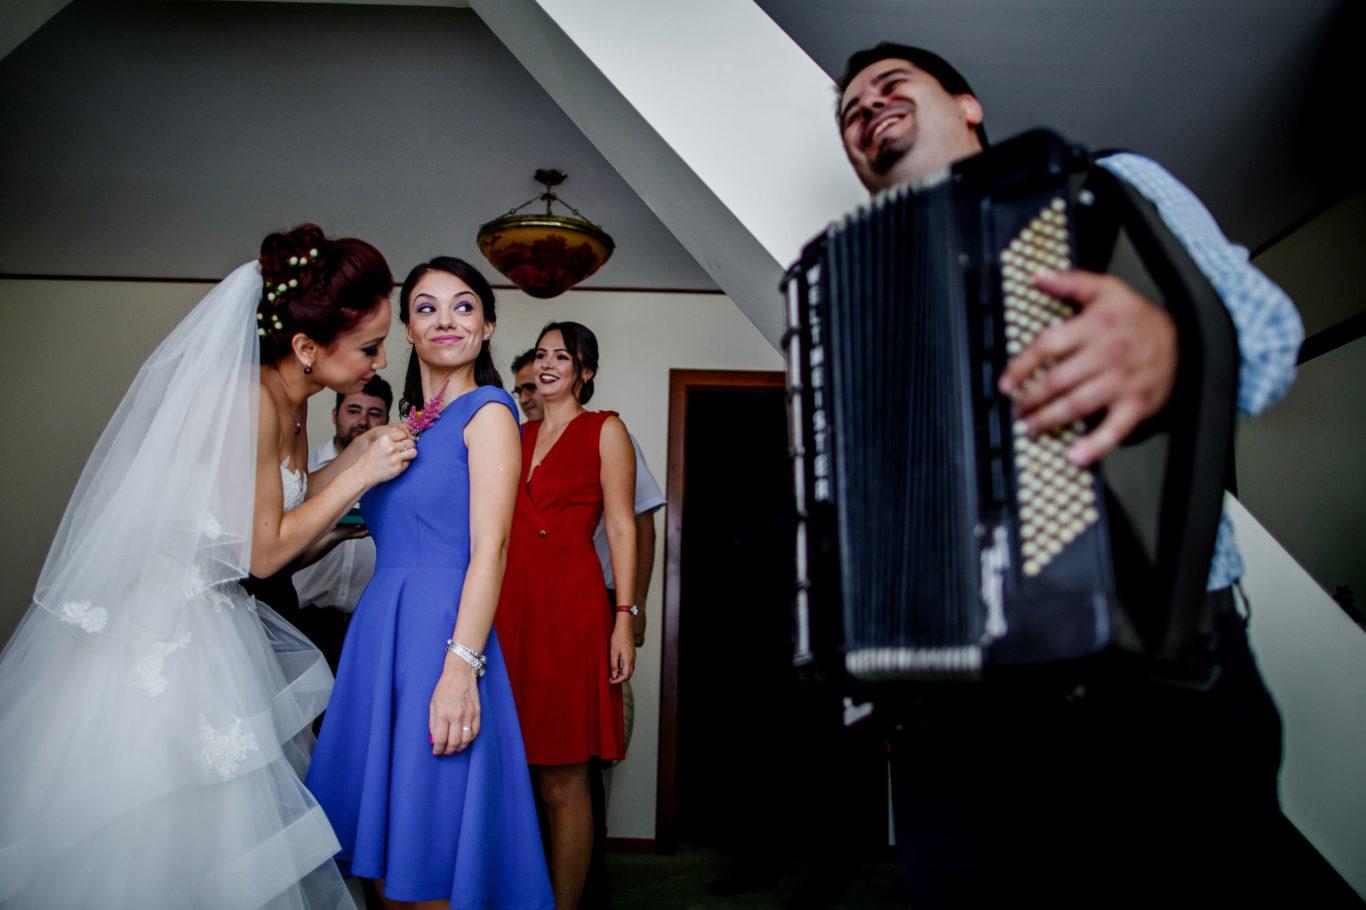 0125-fotografie-nunta-bucuresti-cristina-nicusor-fotograf-ciprian-dumitrescu-dc1_9981